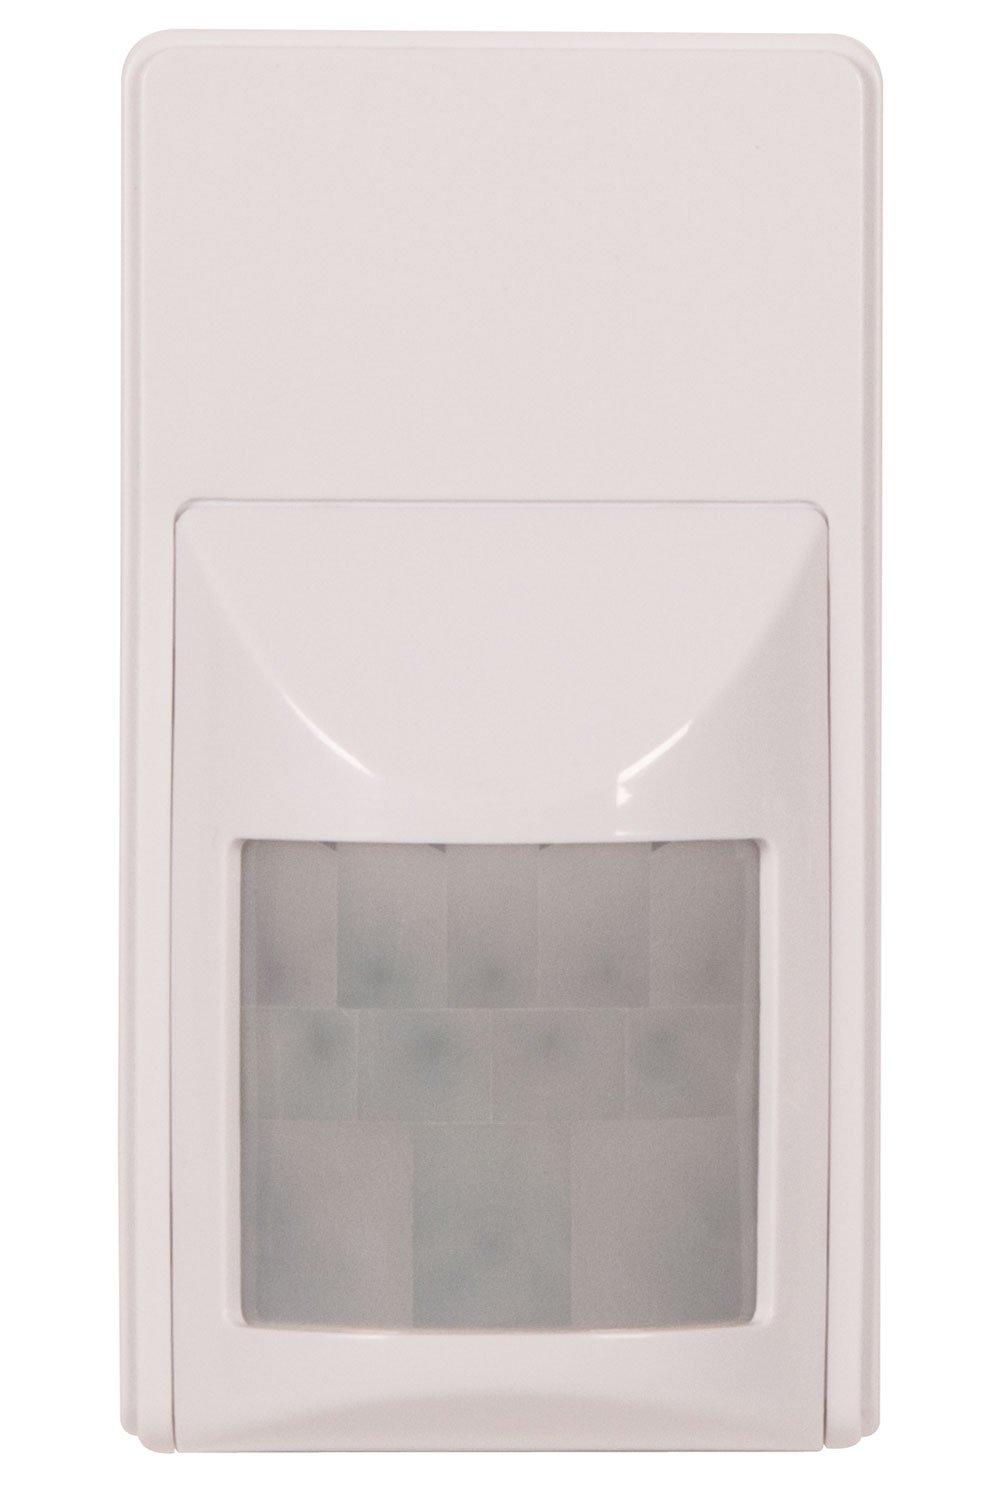 Safety Technology International, Inc. STI-WS103  Burglar Stopper PIR Motion Sensor